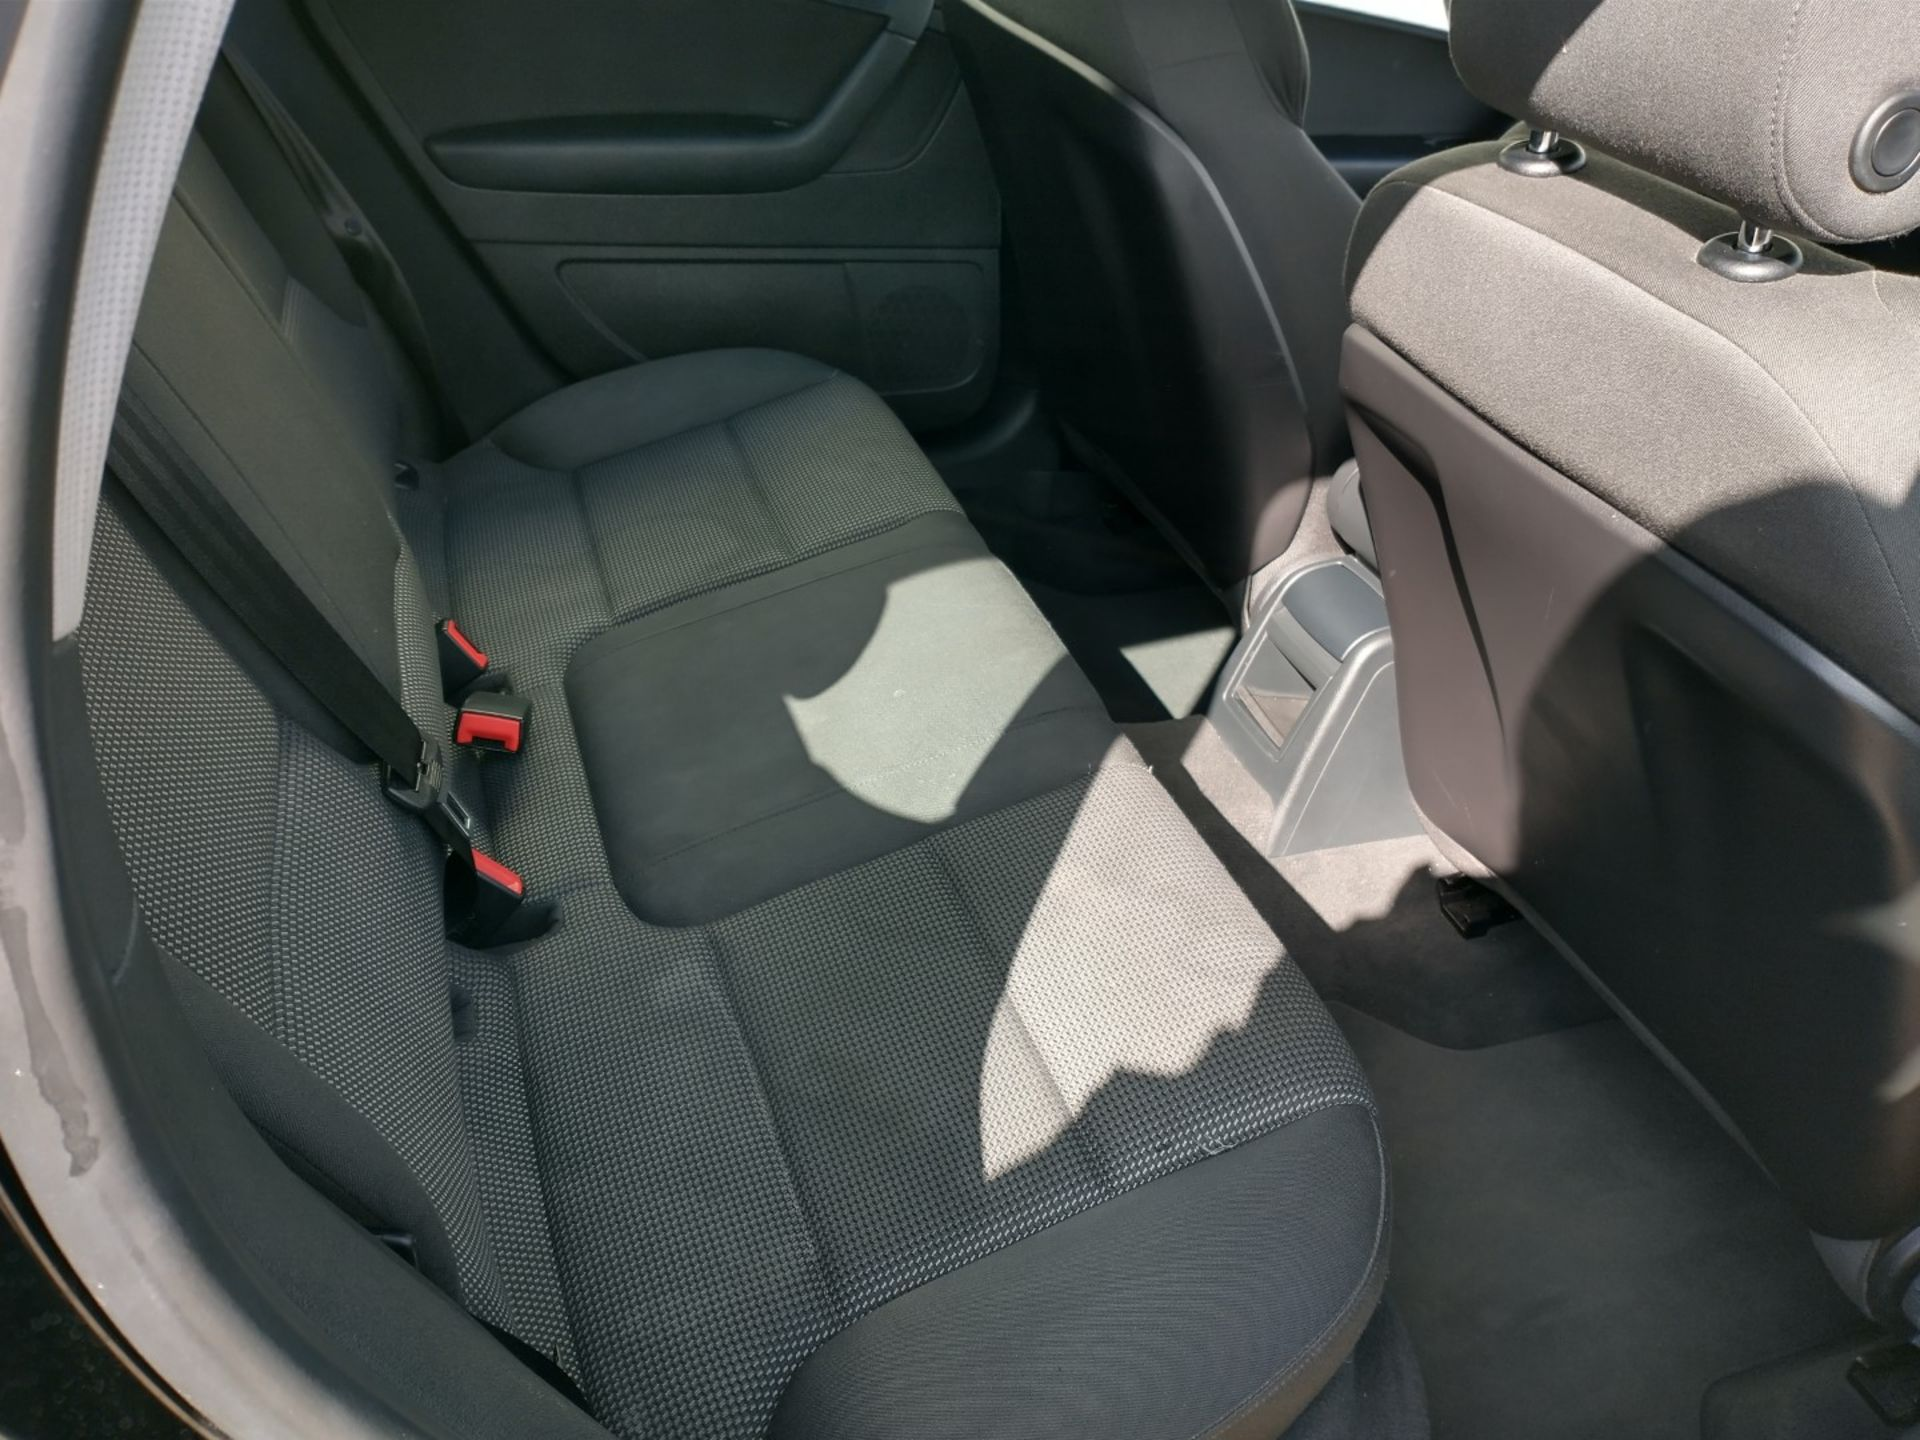 2012 Audi A3 Sportback 1.6 Tdi Hatchback - Full Service History - CL505 - NO VAT ON THE HAMMER - - Image 8 of 26